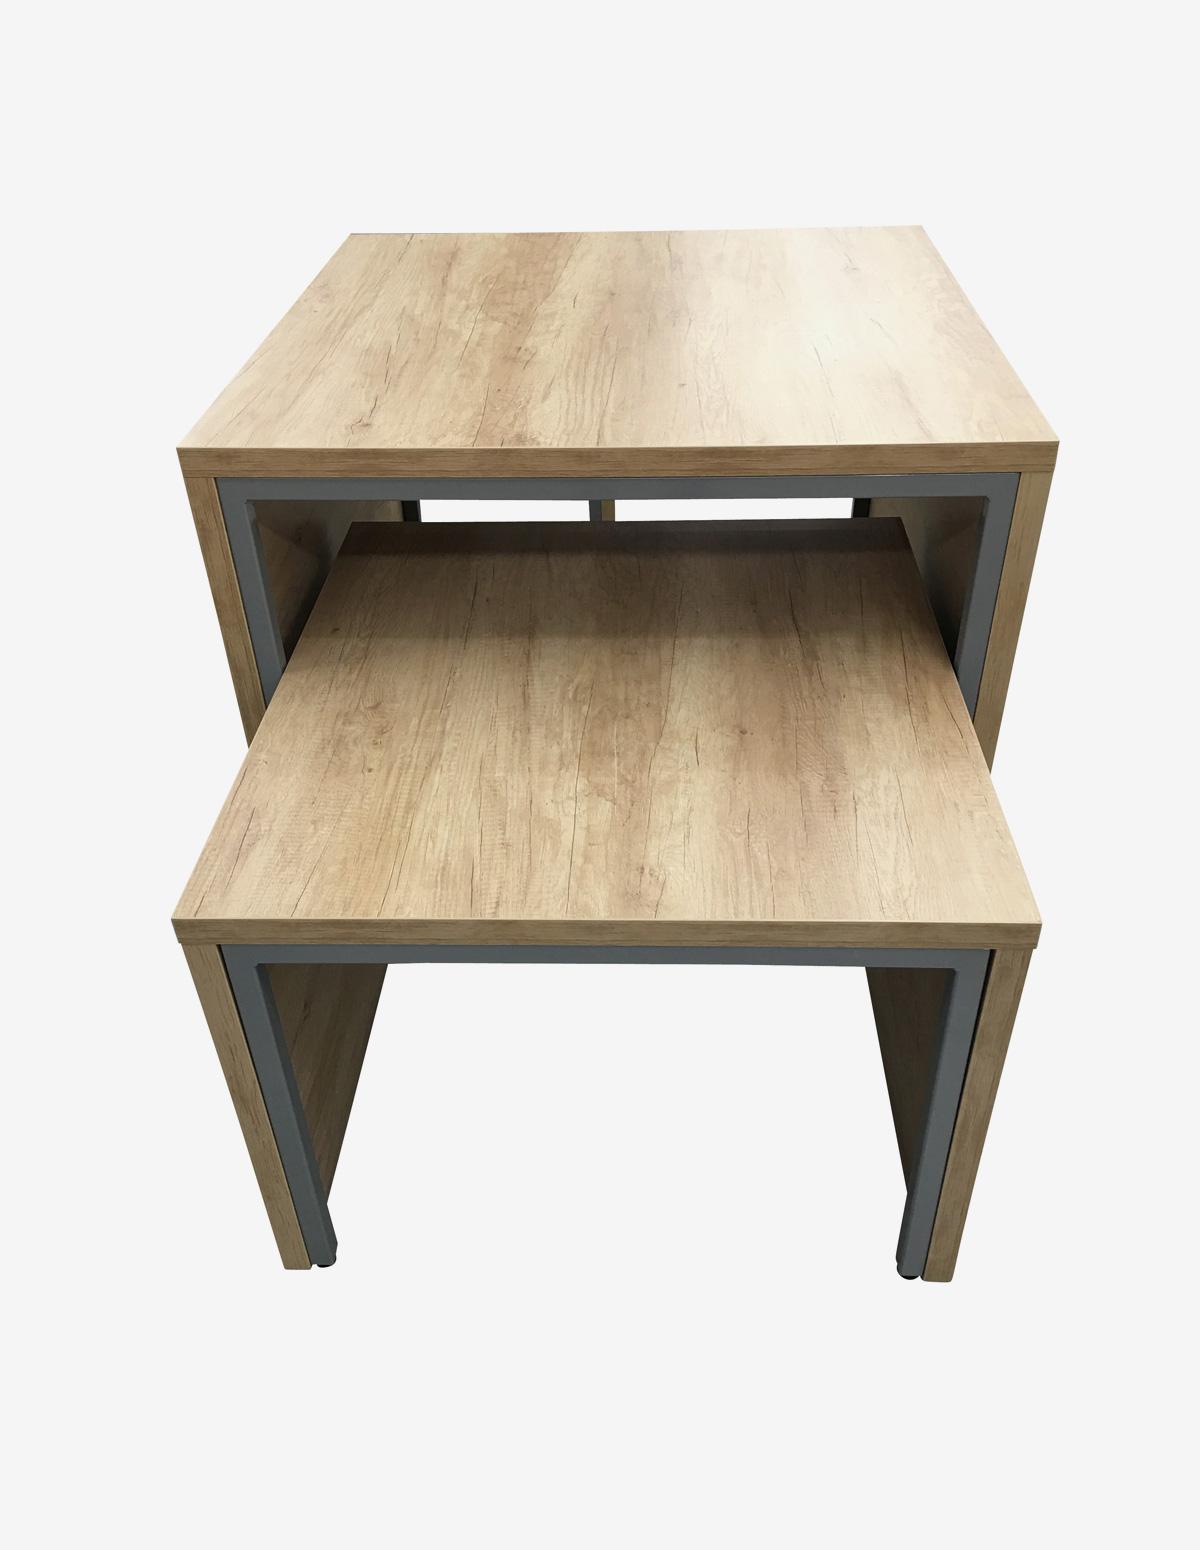 Petite table gigogne idwood - Petite table gigogne ...